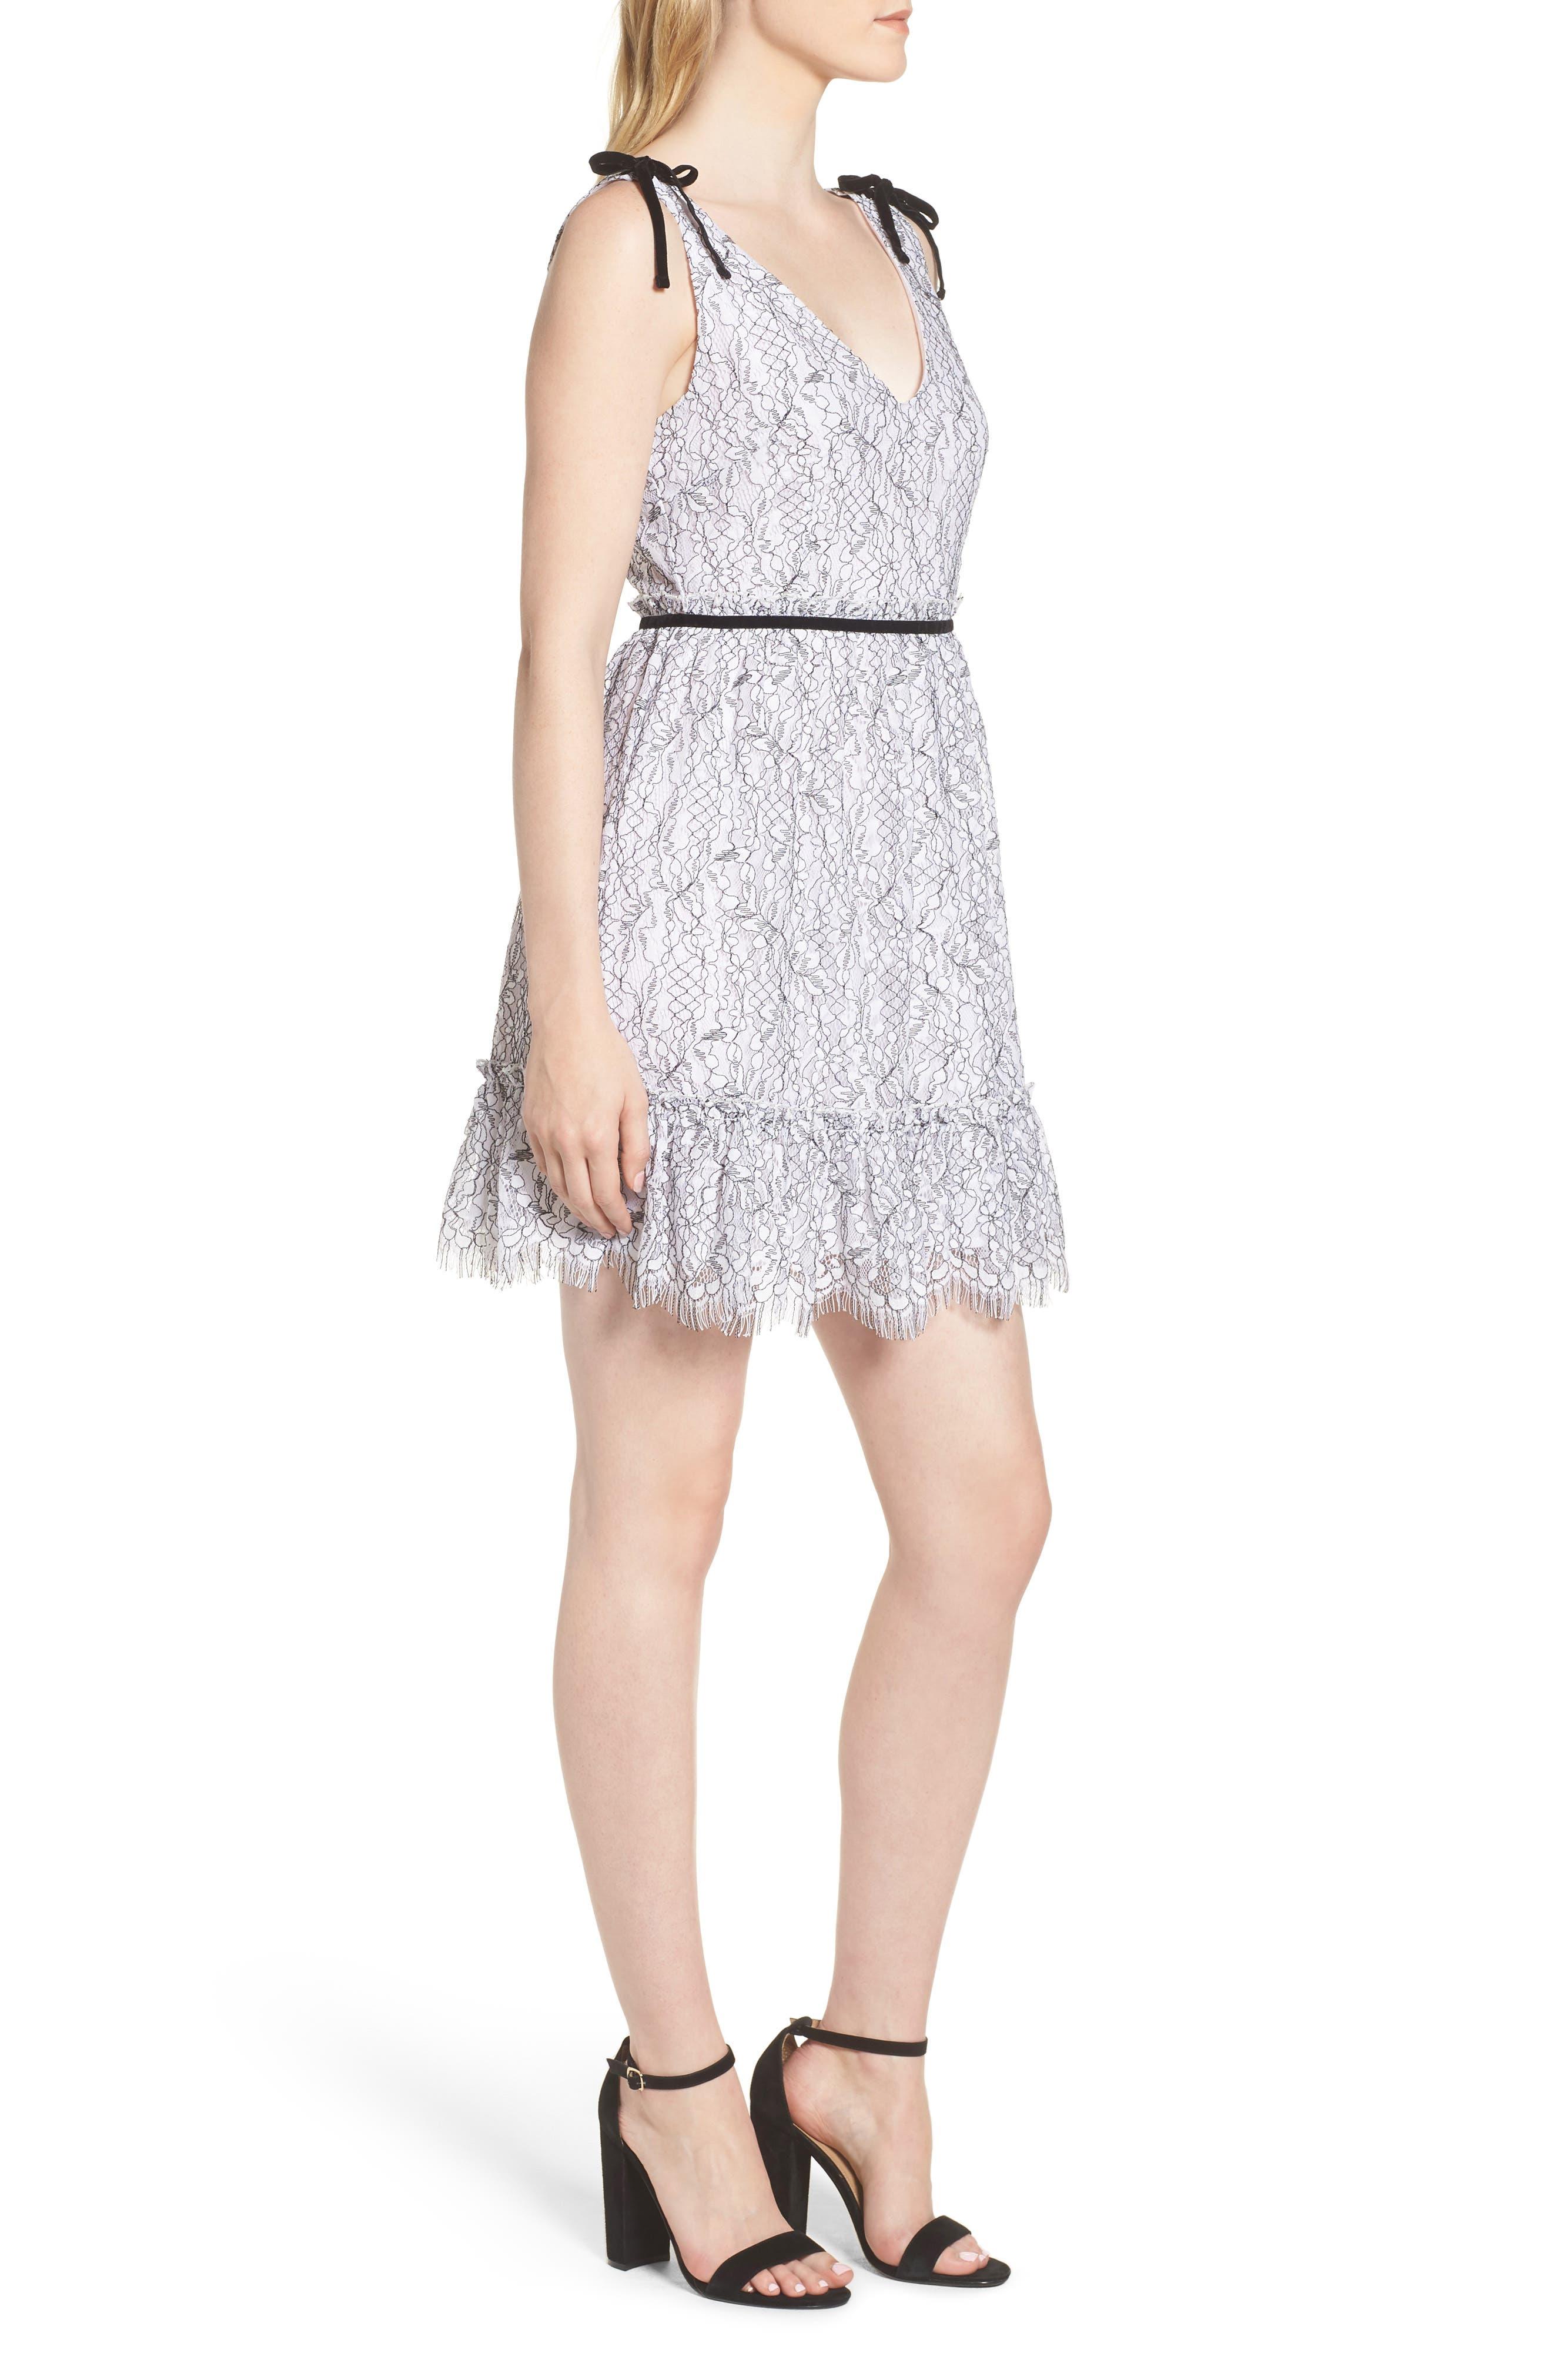 Ezzy Lace Dress,                             Alternate thumbnail 3, color,                             IVORY